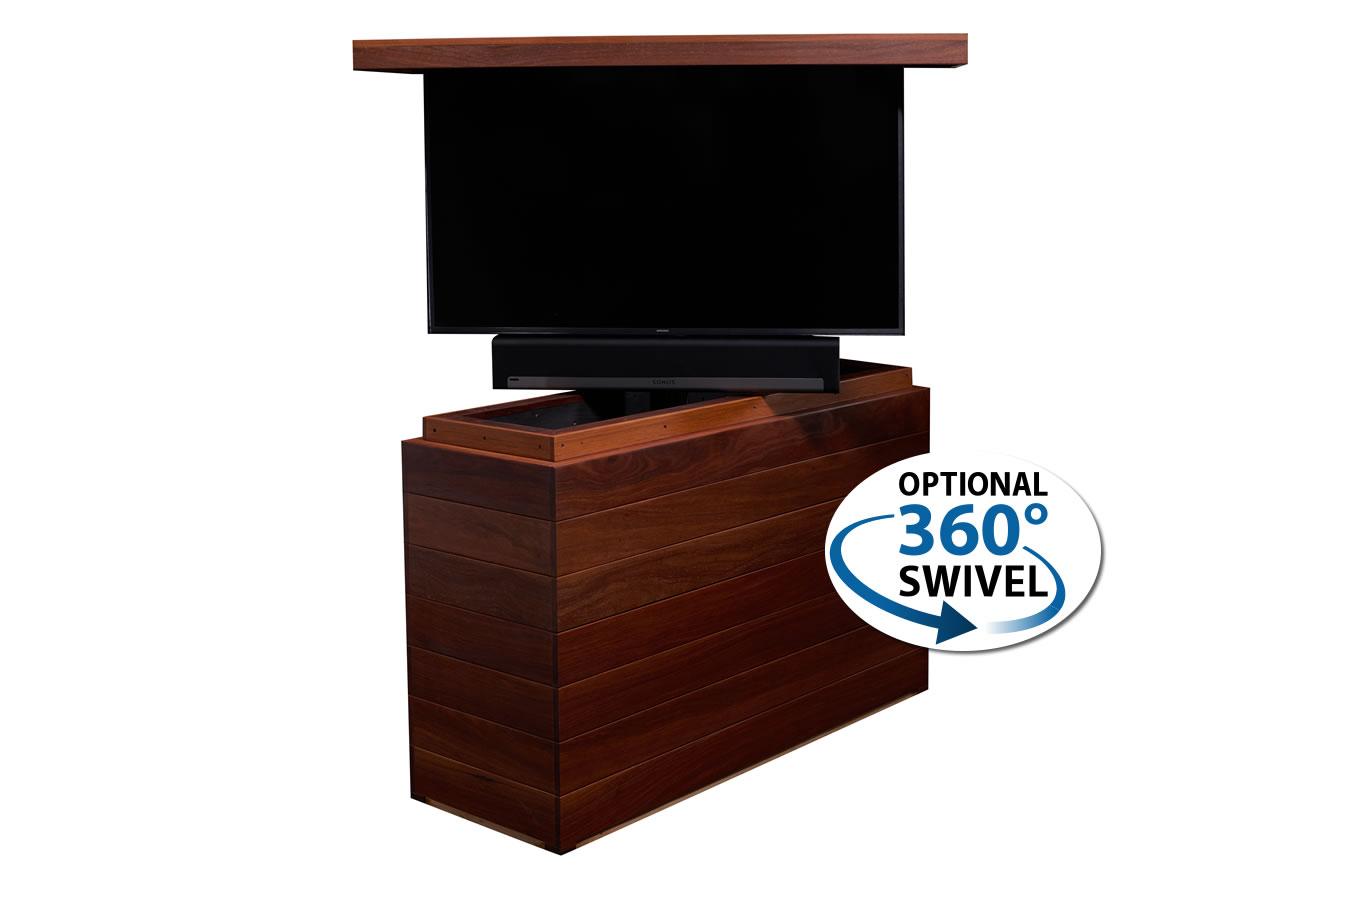 ... Cabinet Tronix Outdoor Cumaru Wood TV Lift Furniture Hides Samsung 55  Inch And Sonos Playbar In ...